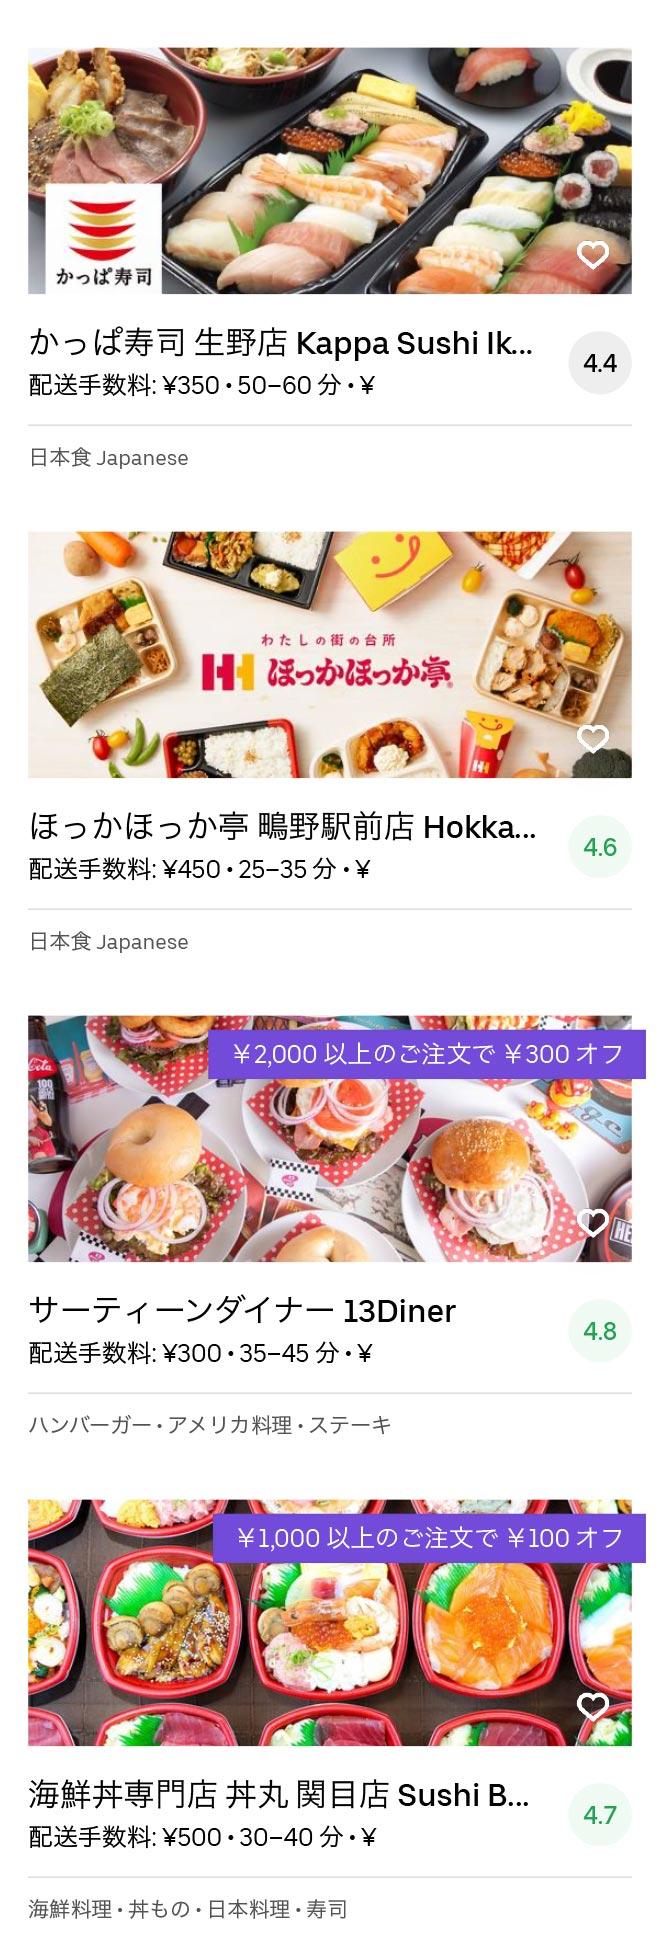 Higashi osaka nagata menu 2005 08